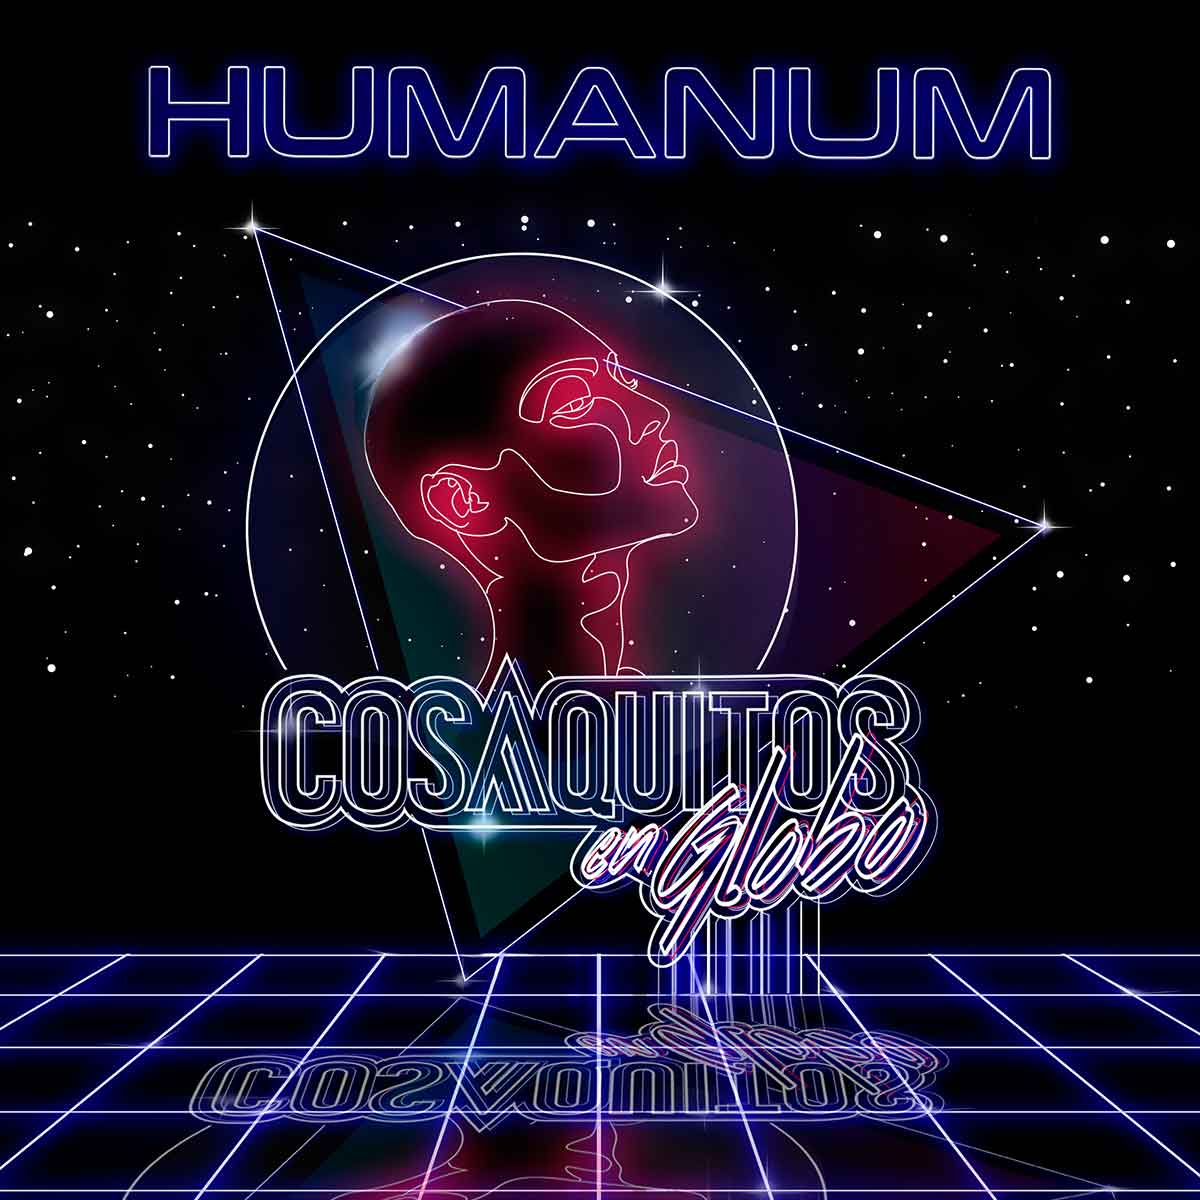 Cosaquitos en Globo - Humanum